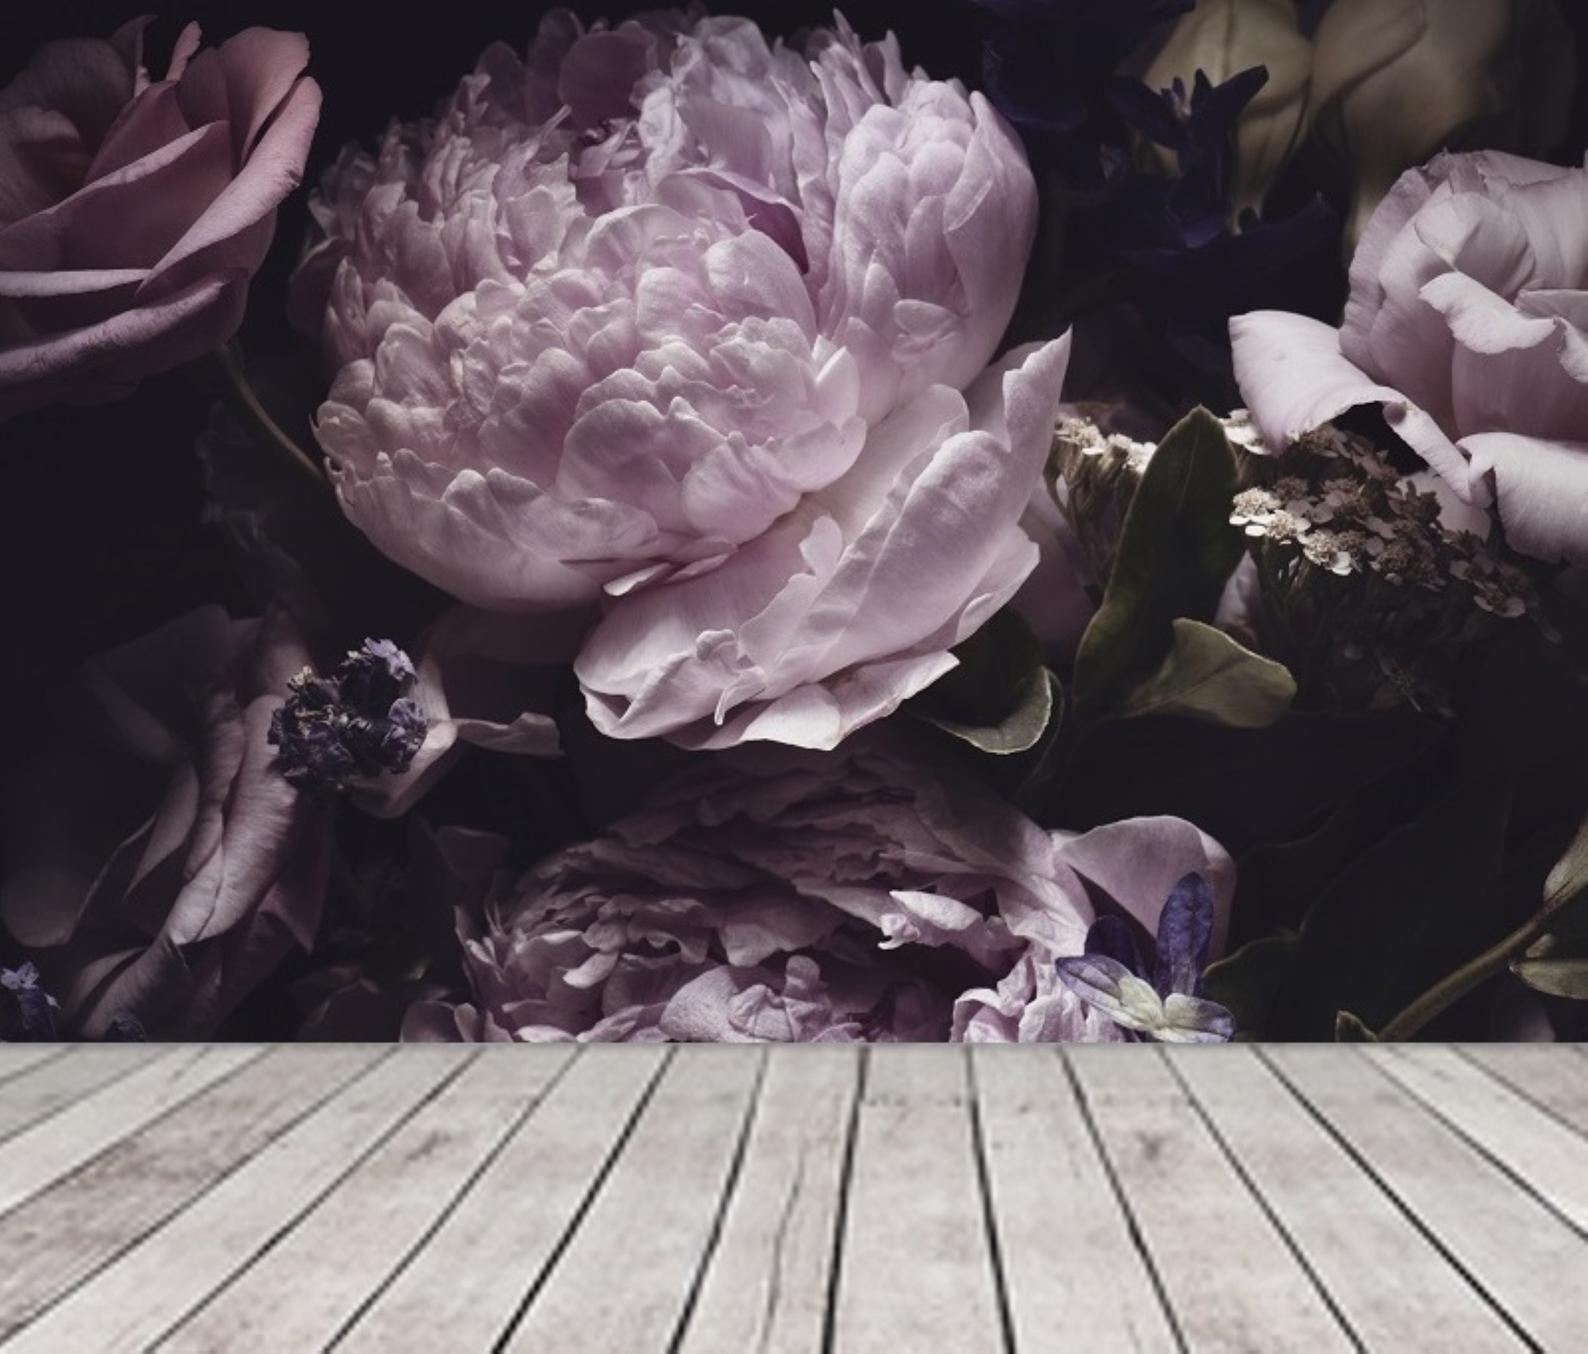 Bright Purple Peonies Wallpaper Mural, Dark Floral